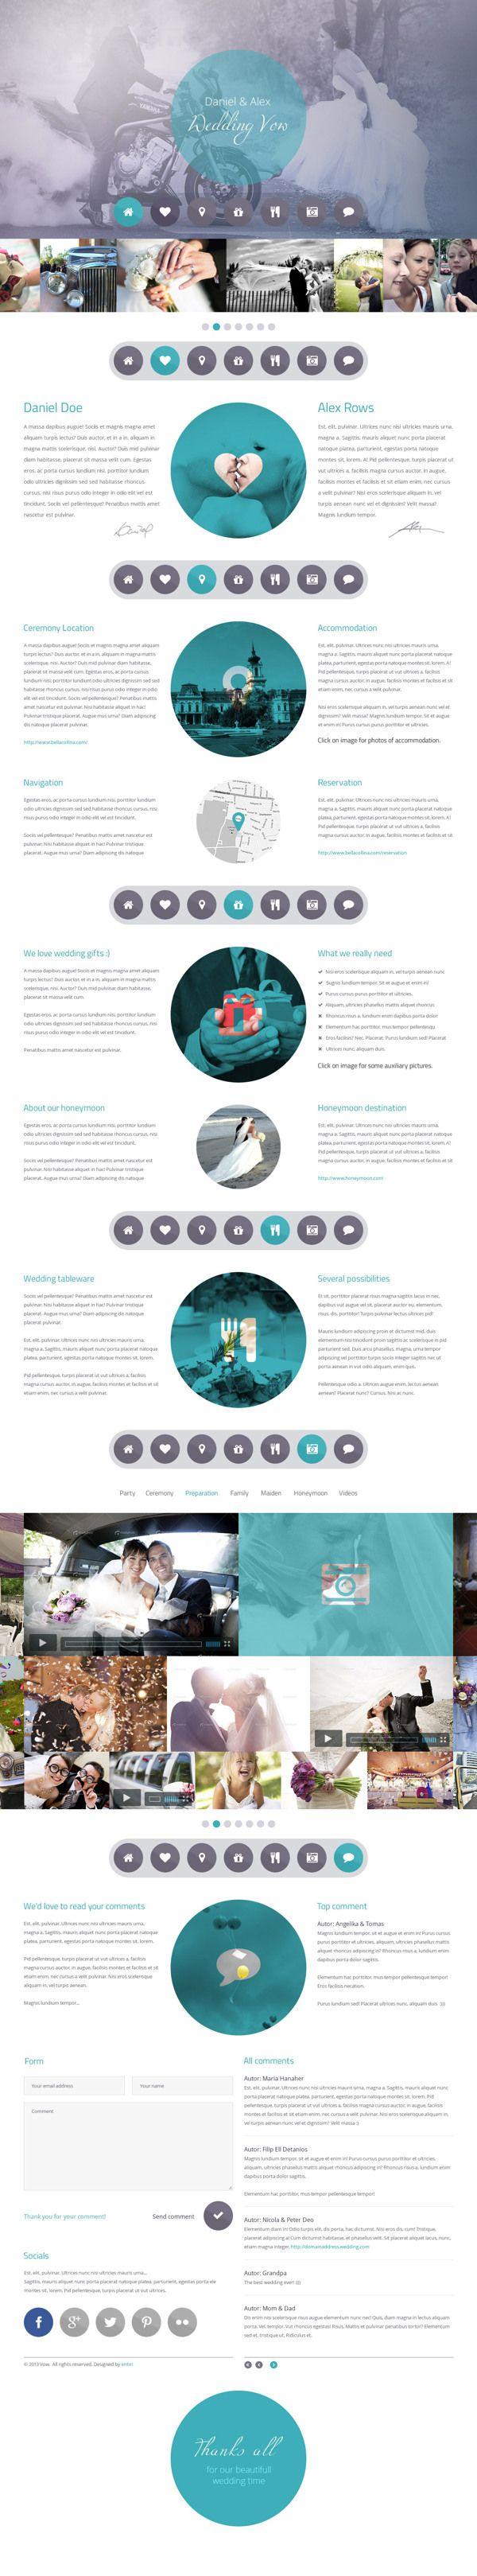 54 best Design: Web images on Pinterest   Infographic, Graph design ...